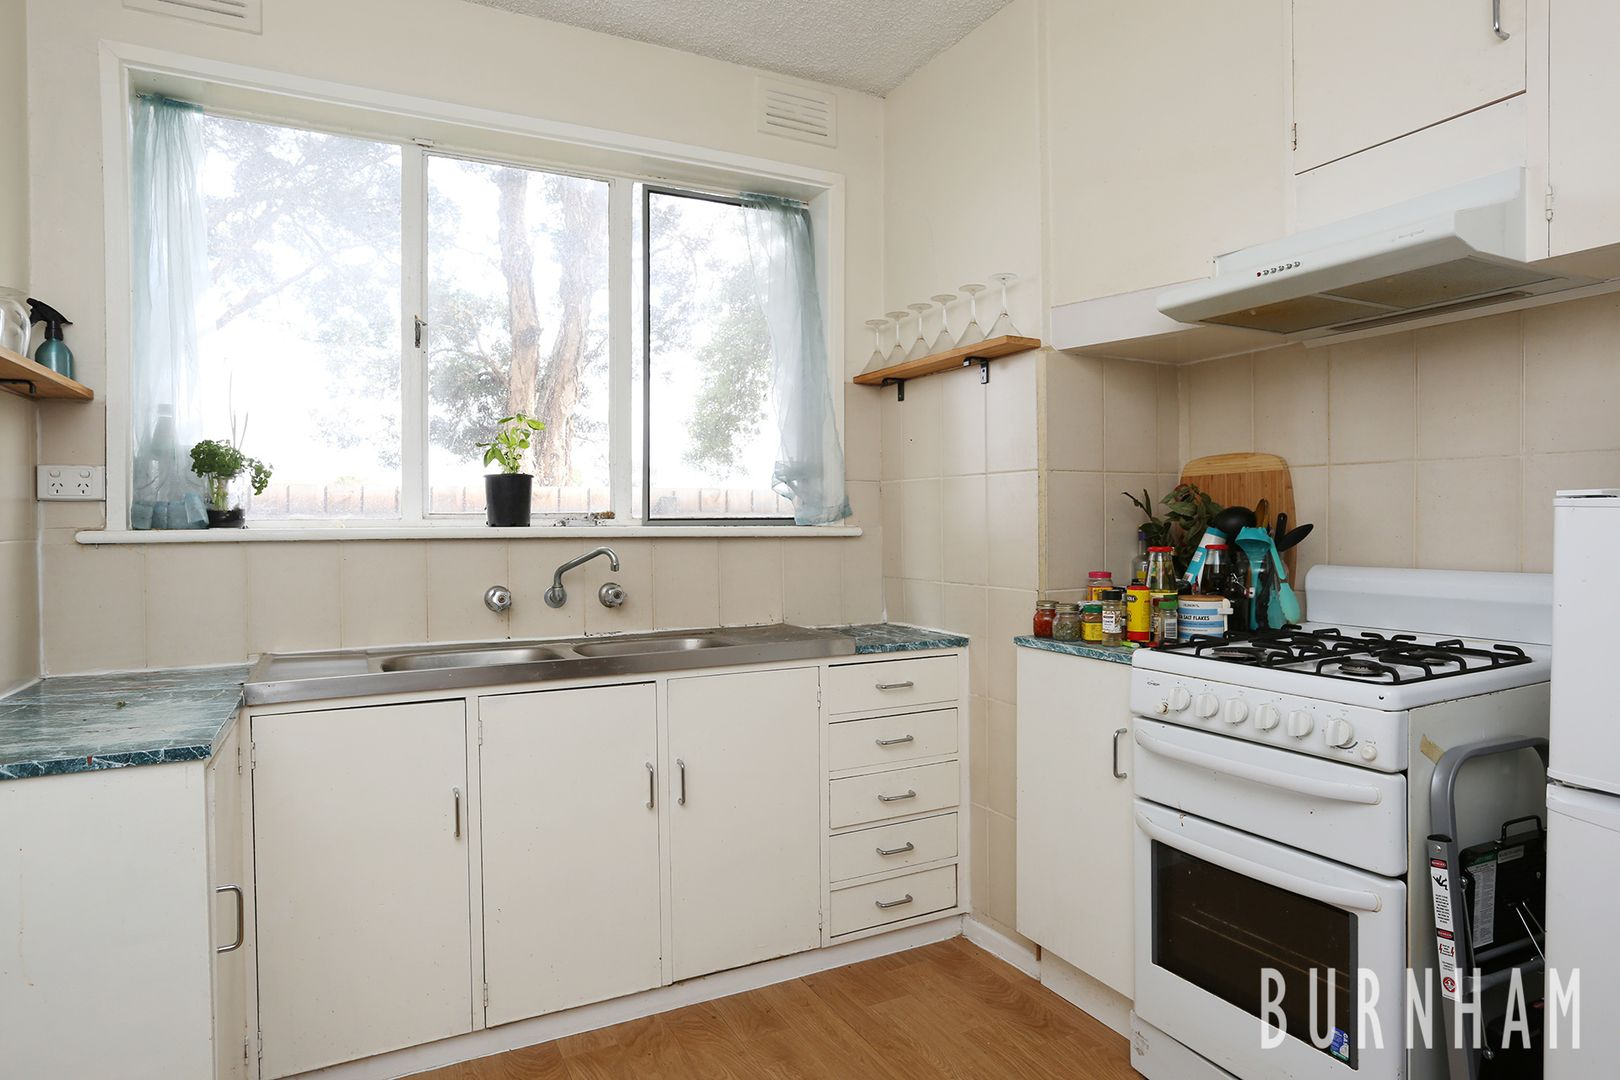 14/22 Blandford Street, West Footscray VIC 3012, Image 2